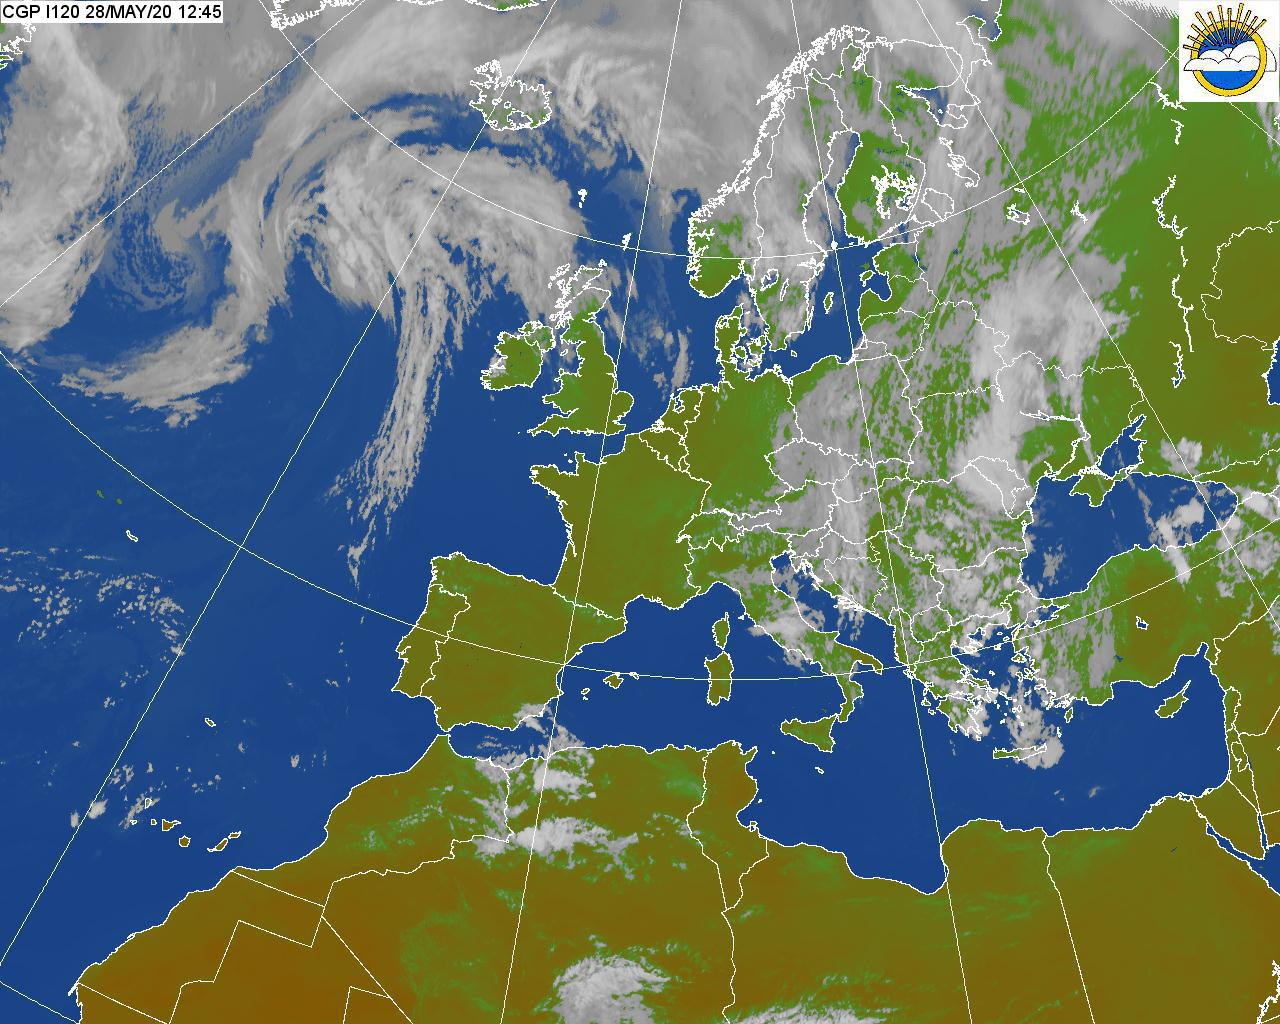 http://www.astrogeo.va.it/tecnavia/EUROPA.JPG